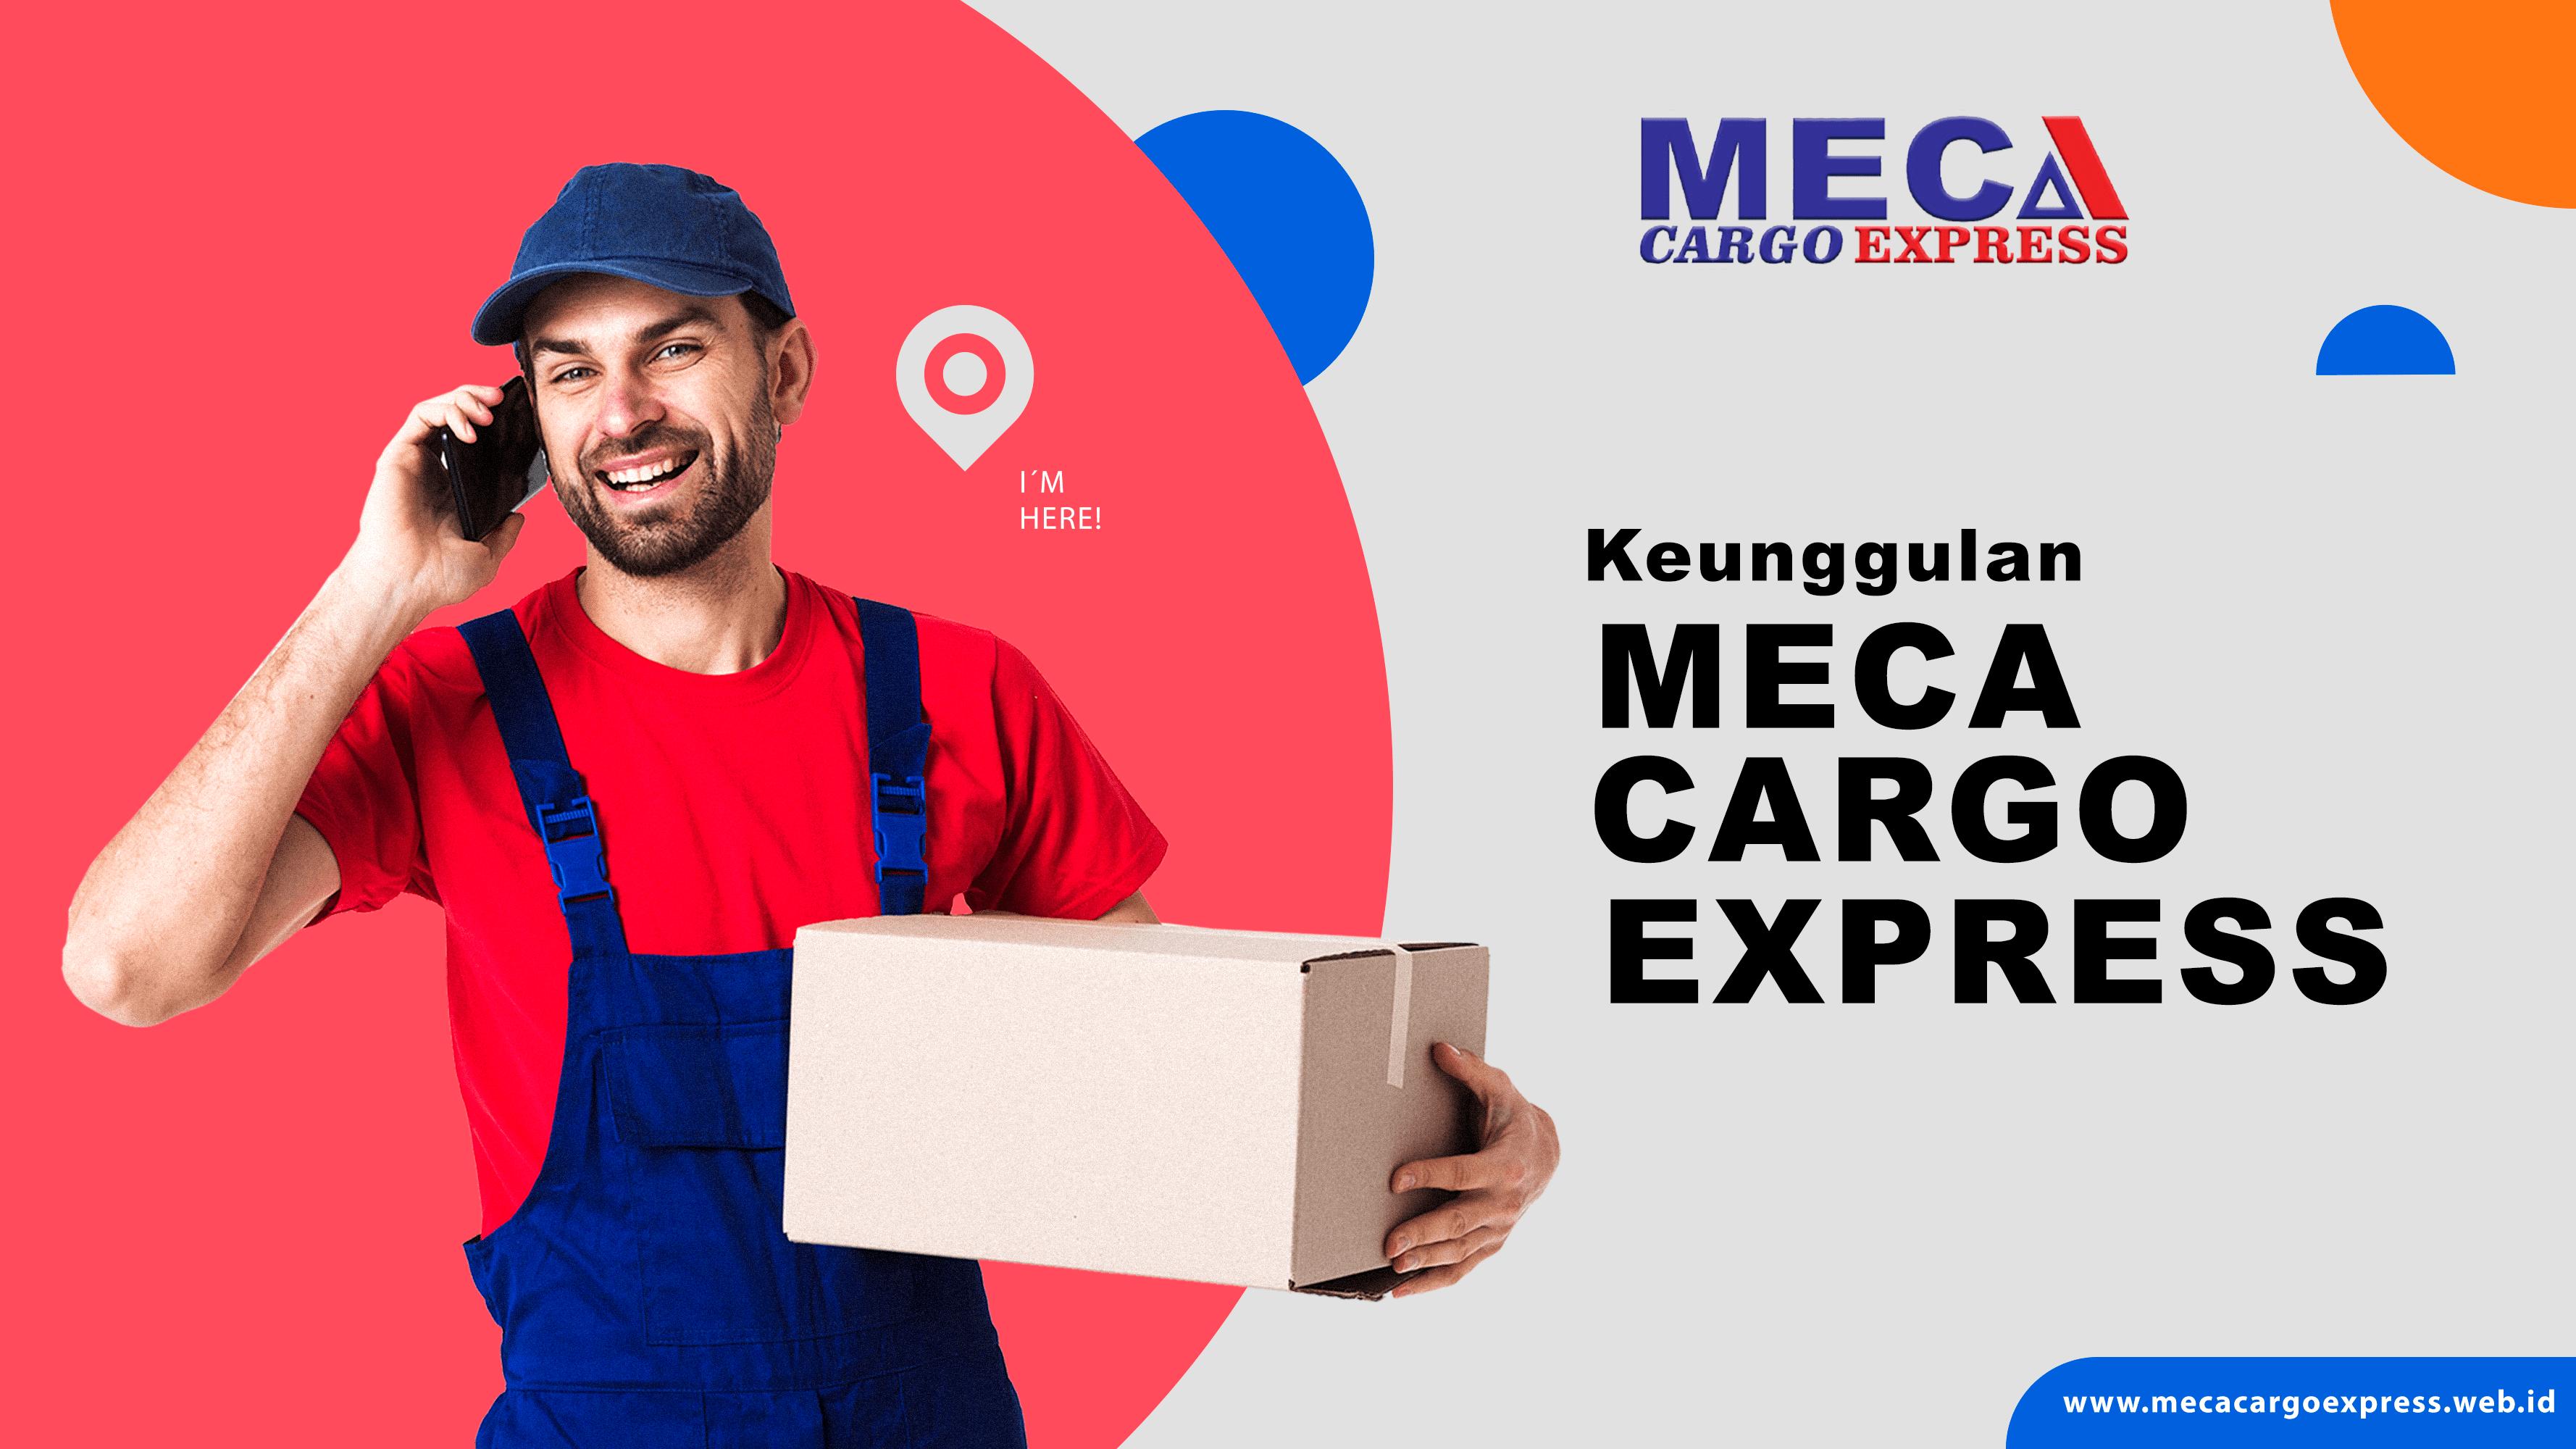 artikel-Meca-Cargo-Express-1-min